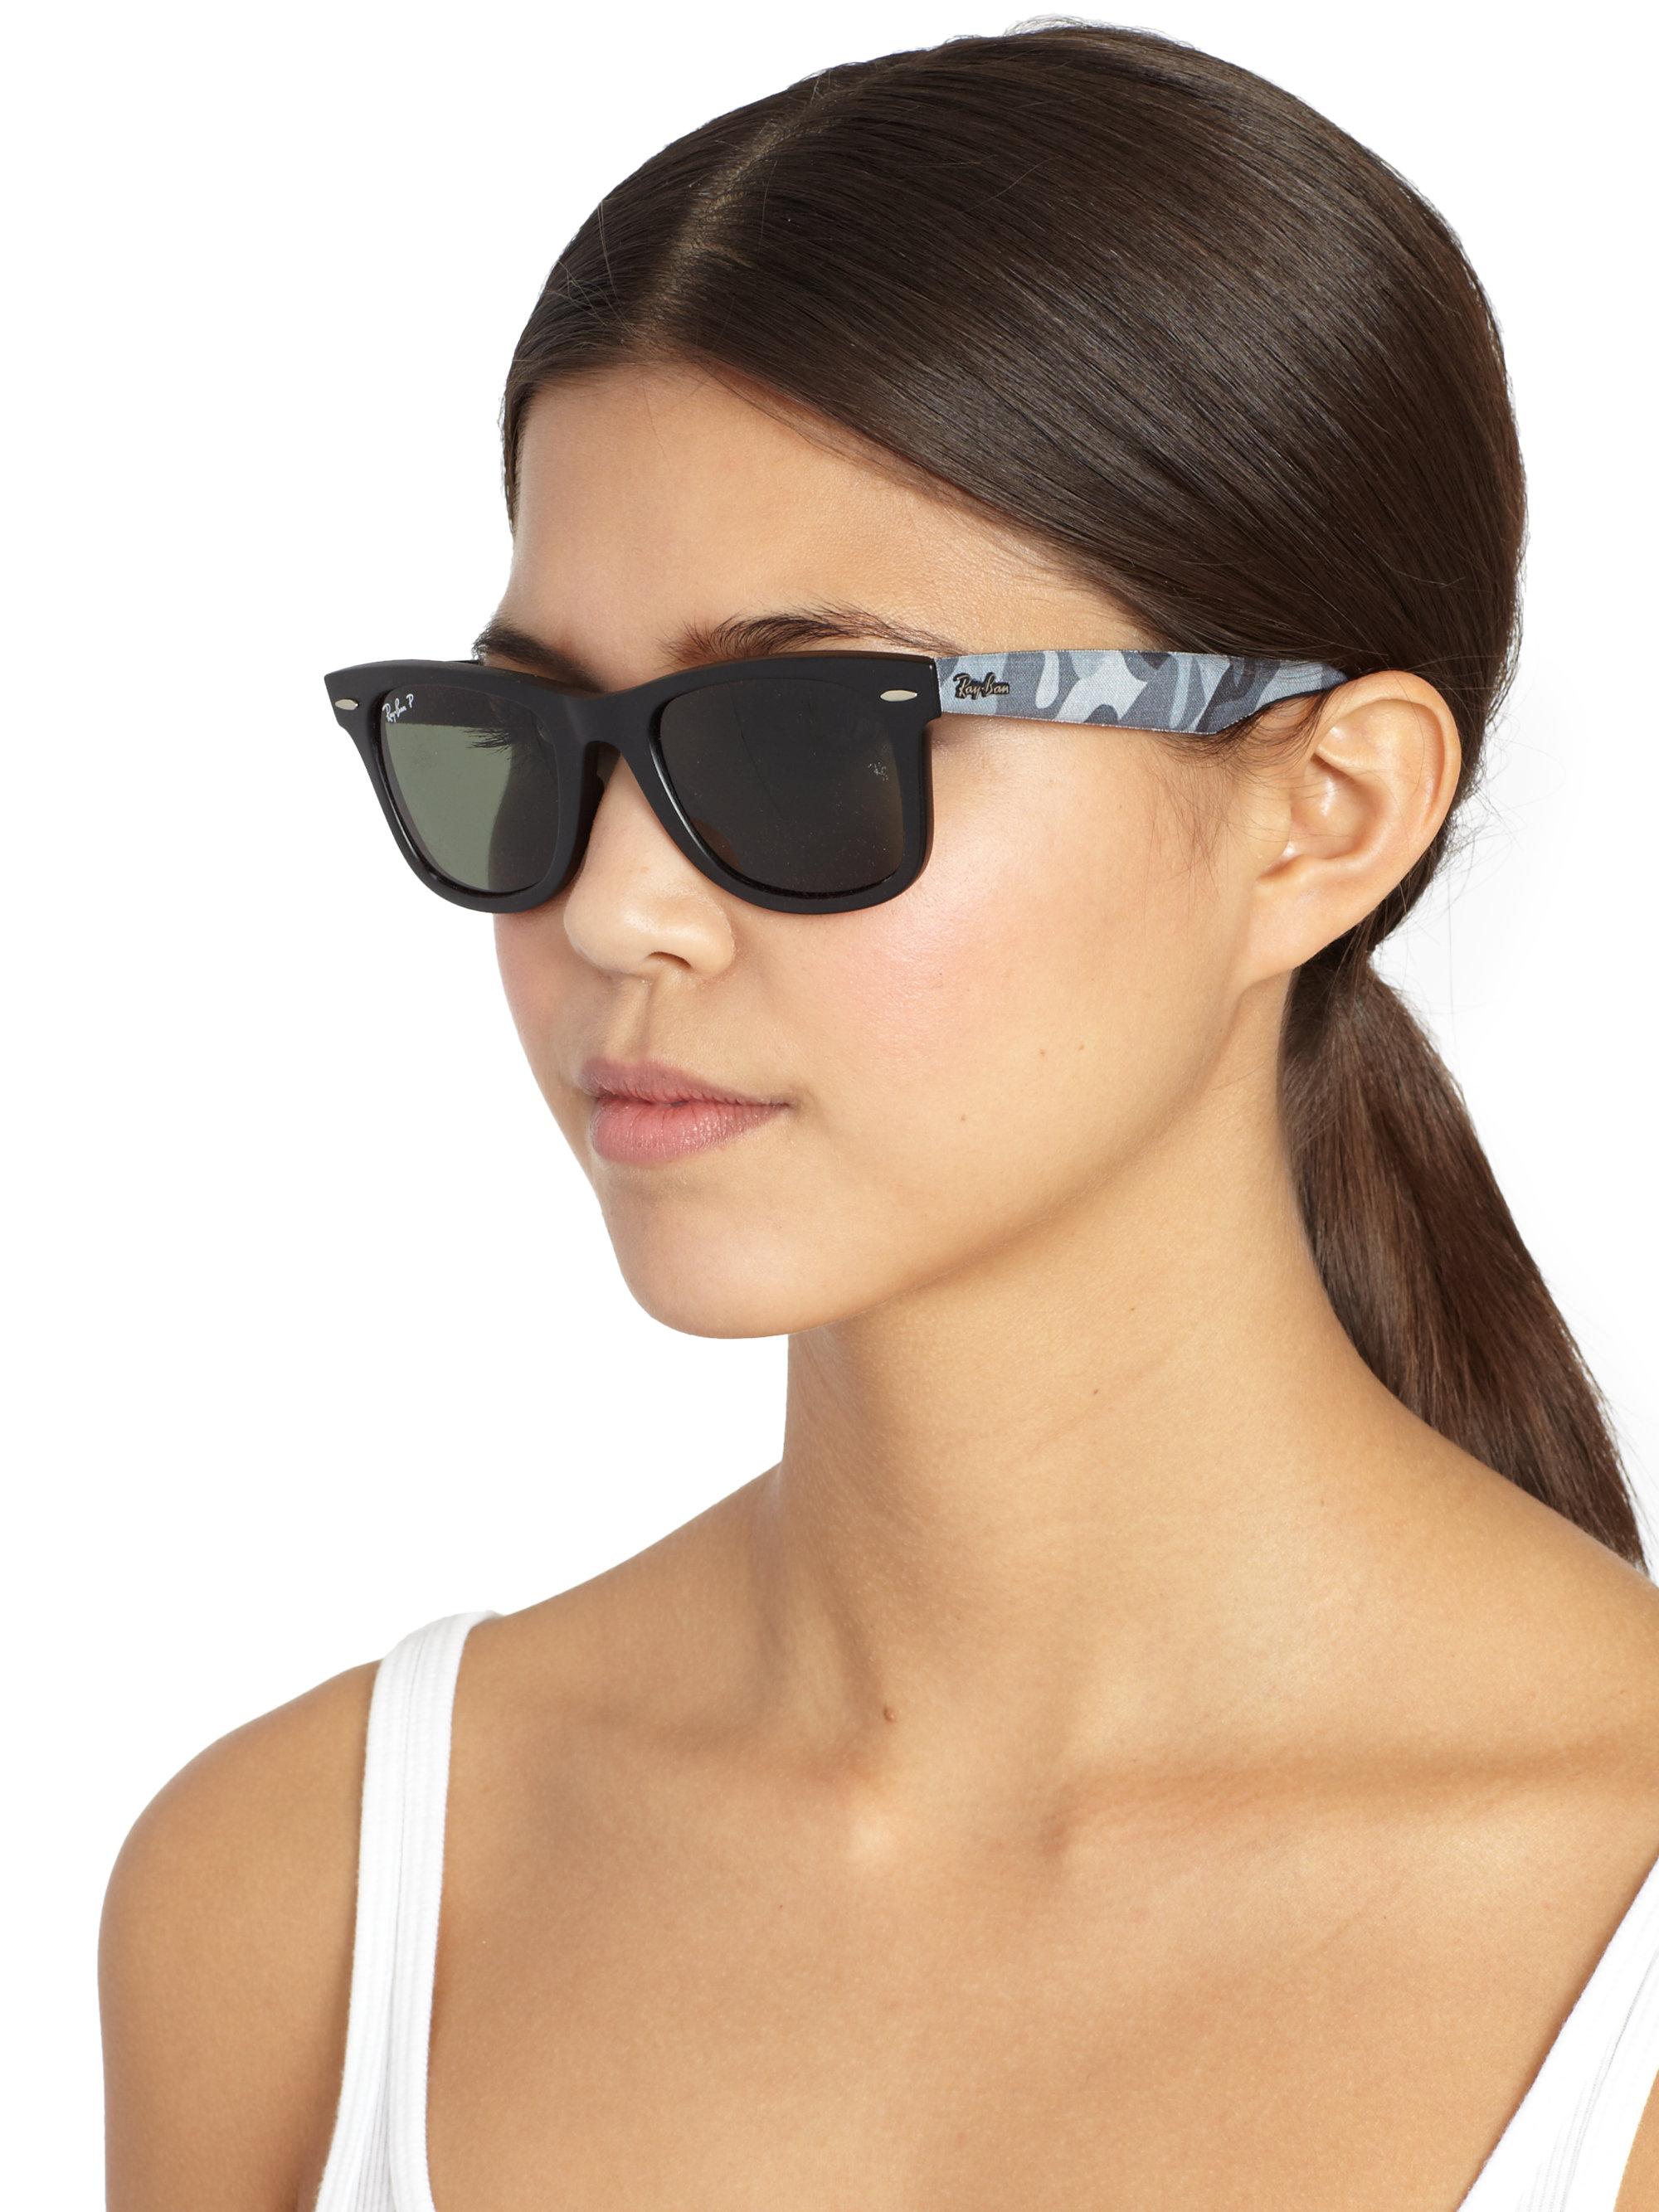 ray ban wayfarer 2140 50mm vs 54mm ray ban clubmaster eyeglasses ... 9133025189